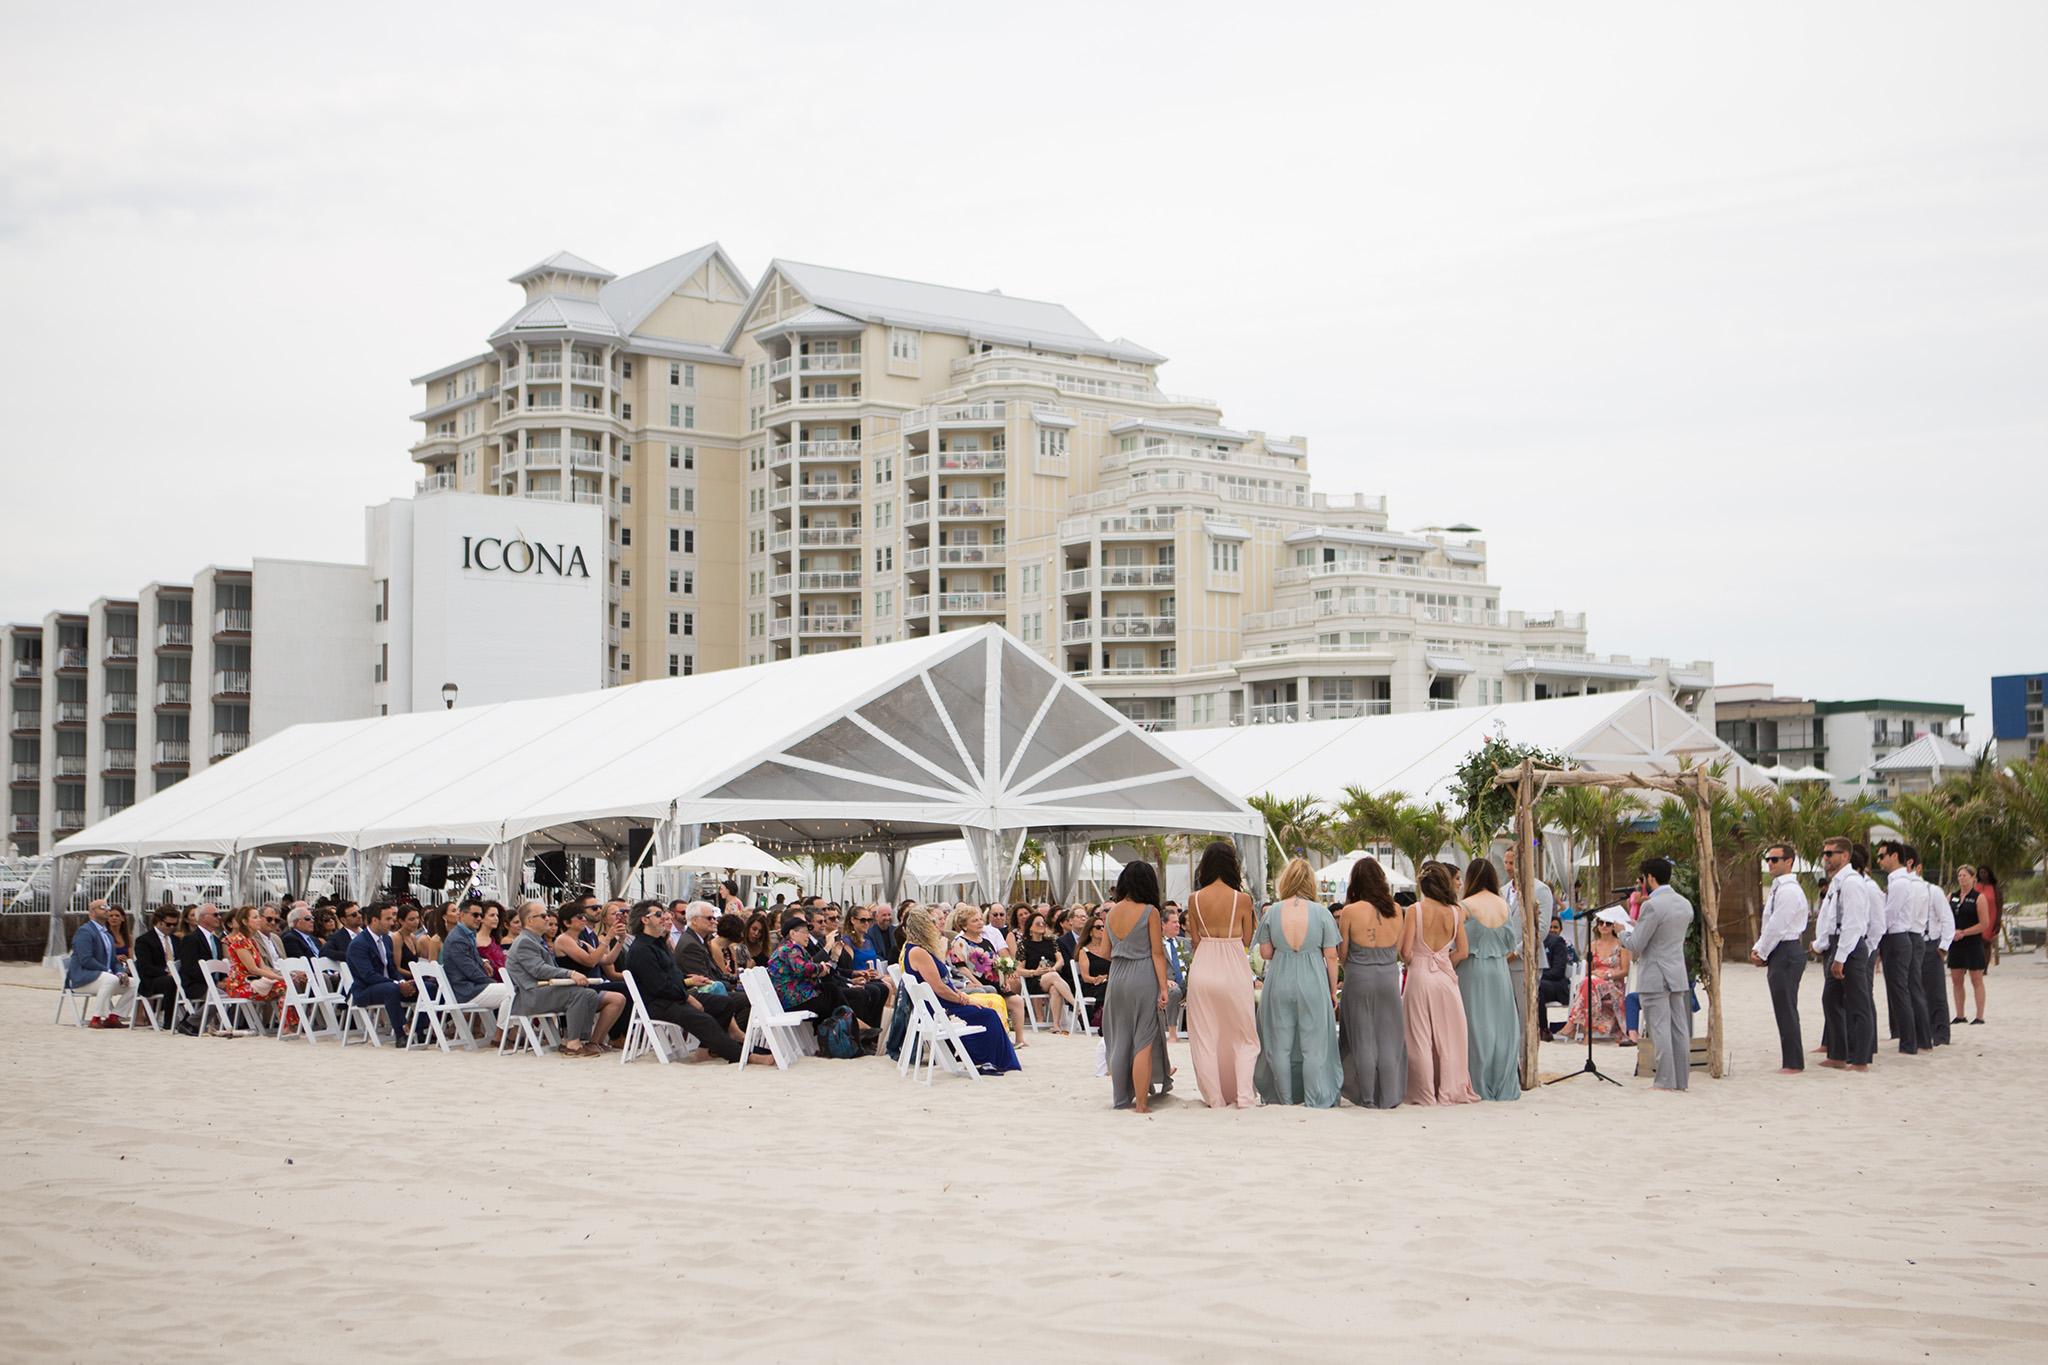 icona_diamond_beach_wedding_16.jpg